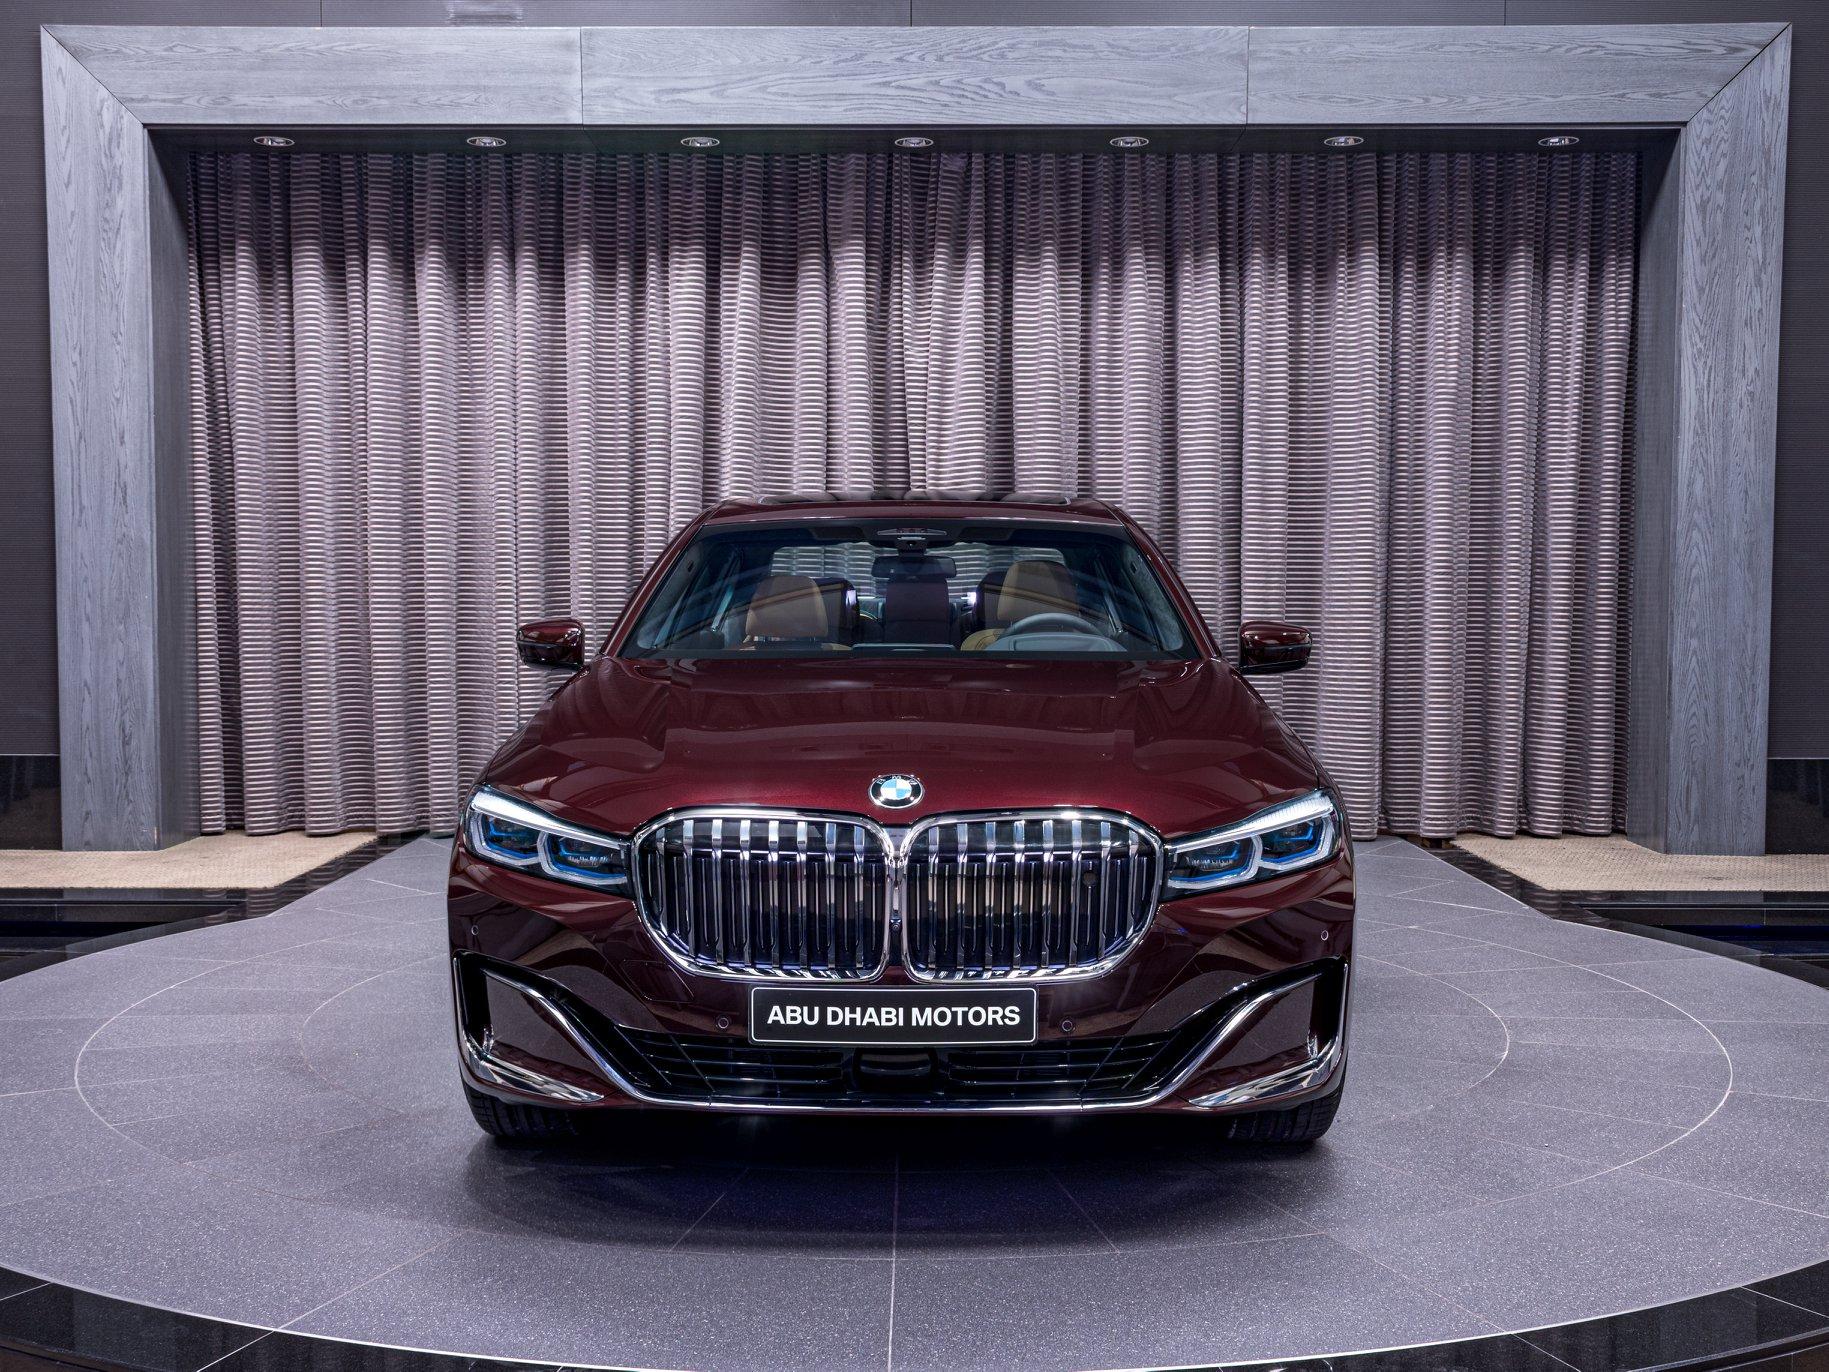 2020_BMW_750Li_Royal_Burgundy_Red_0003